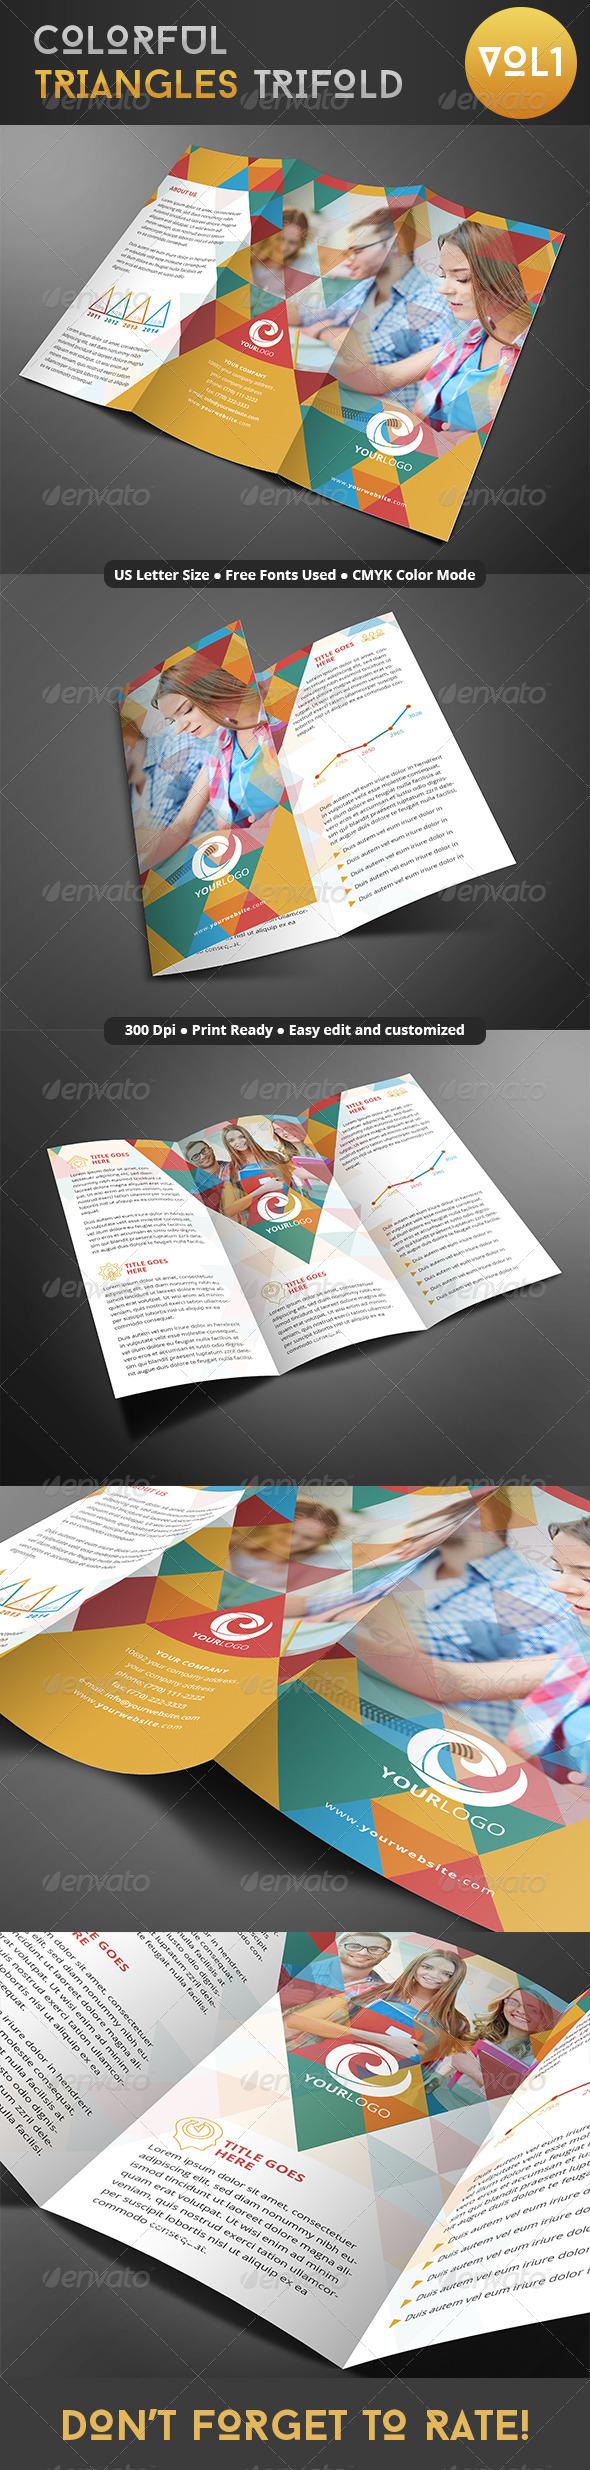 GraphicRiver Colorful Triangles Trifold 8067925